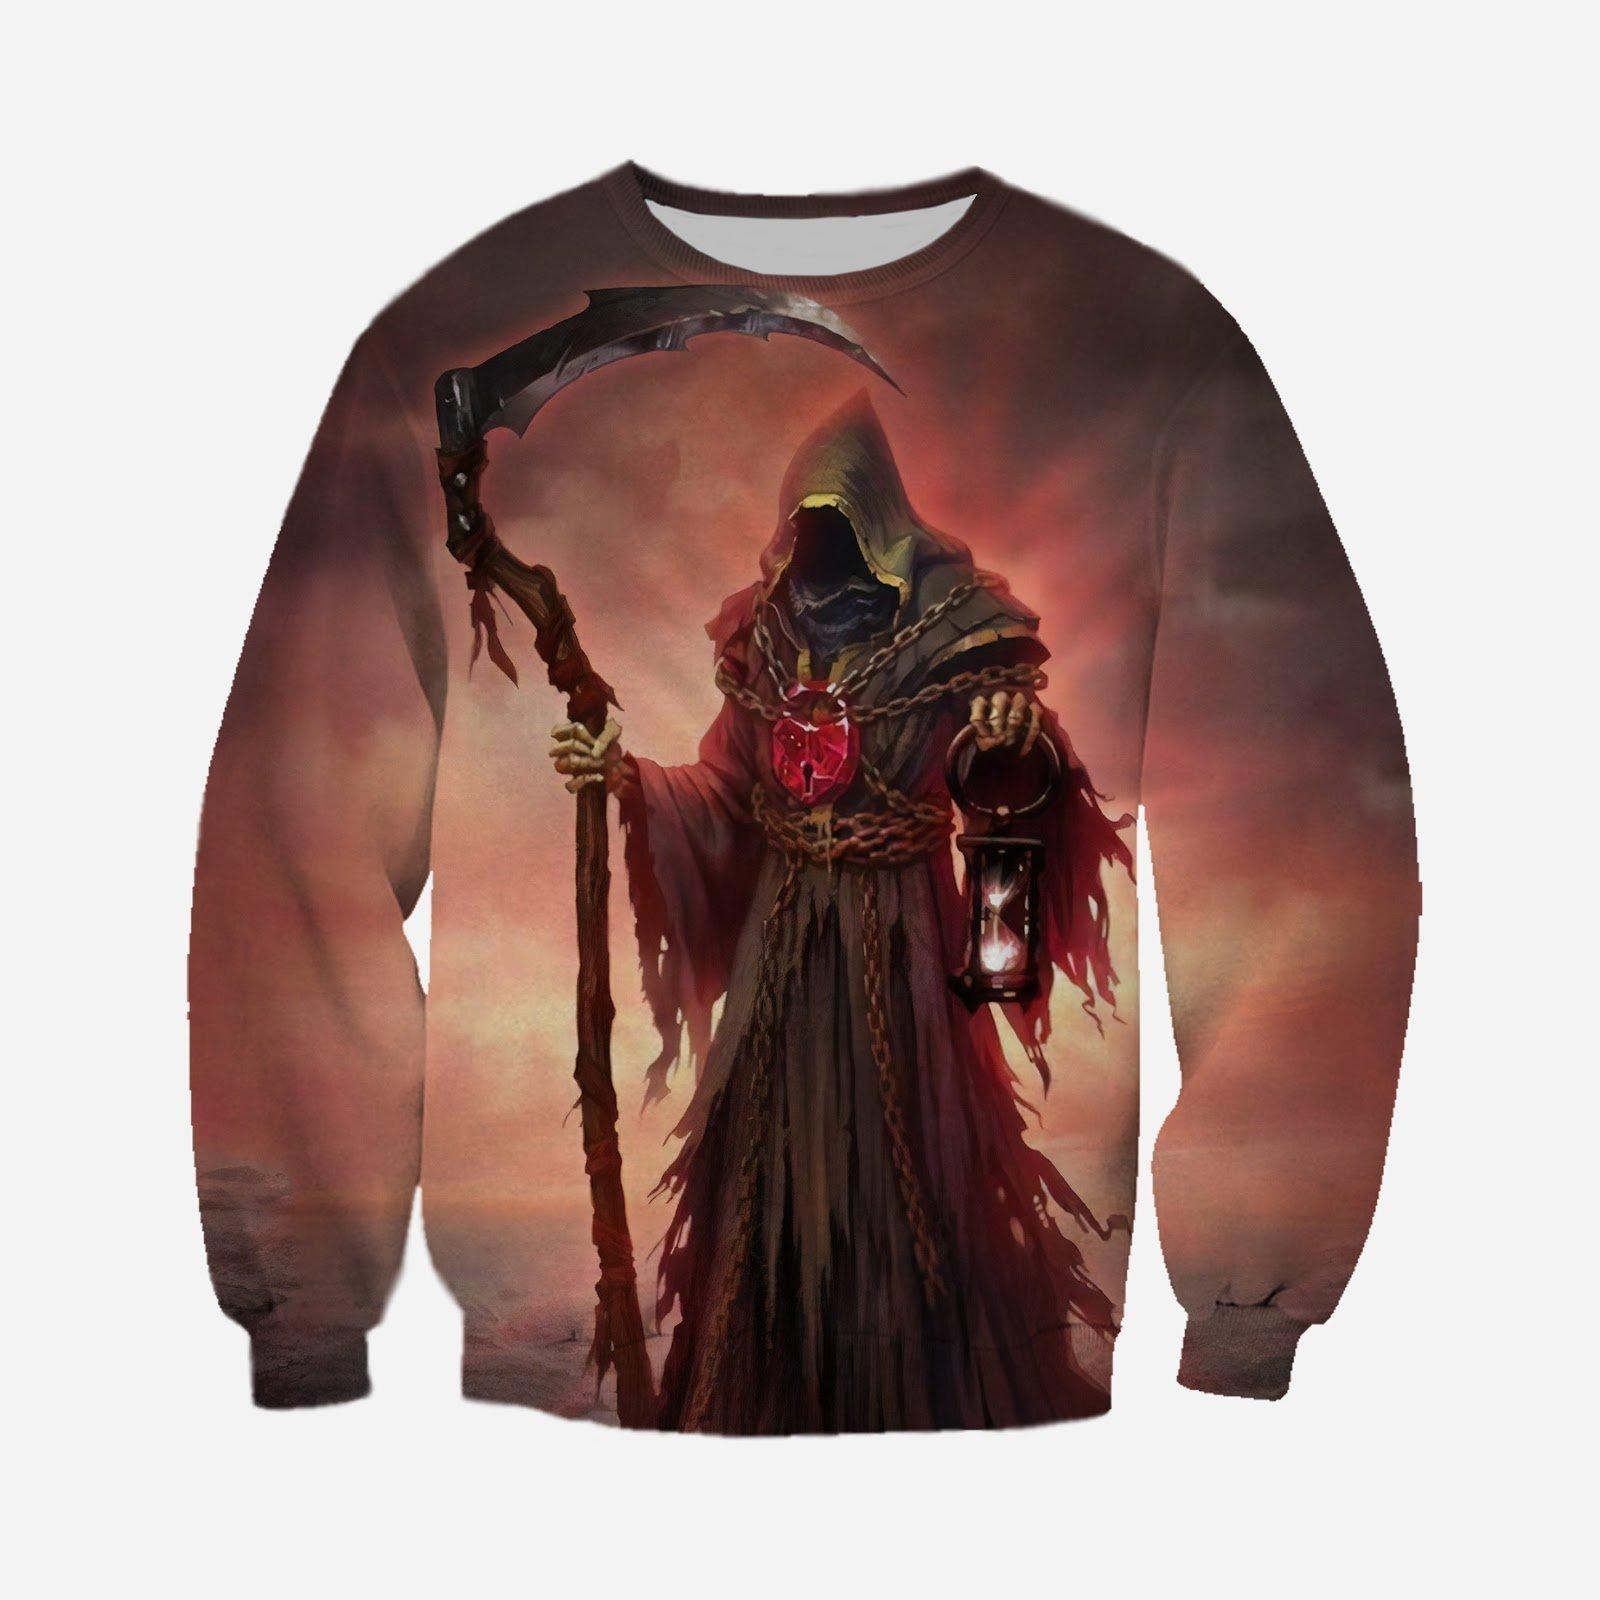 Halloween Death sweatshirt 3D